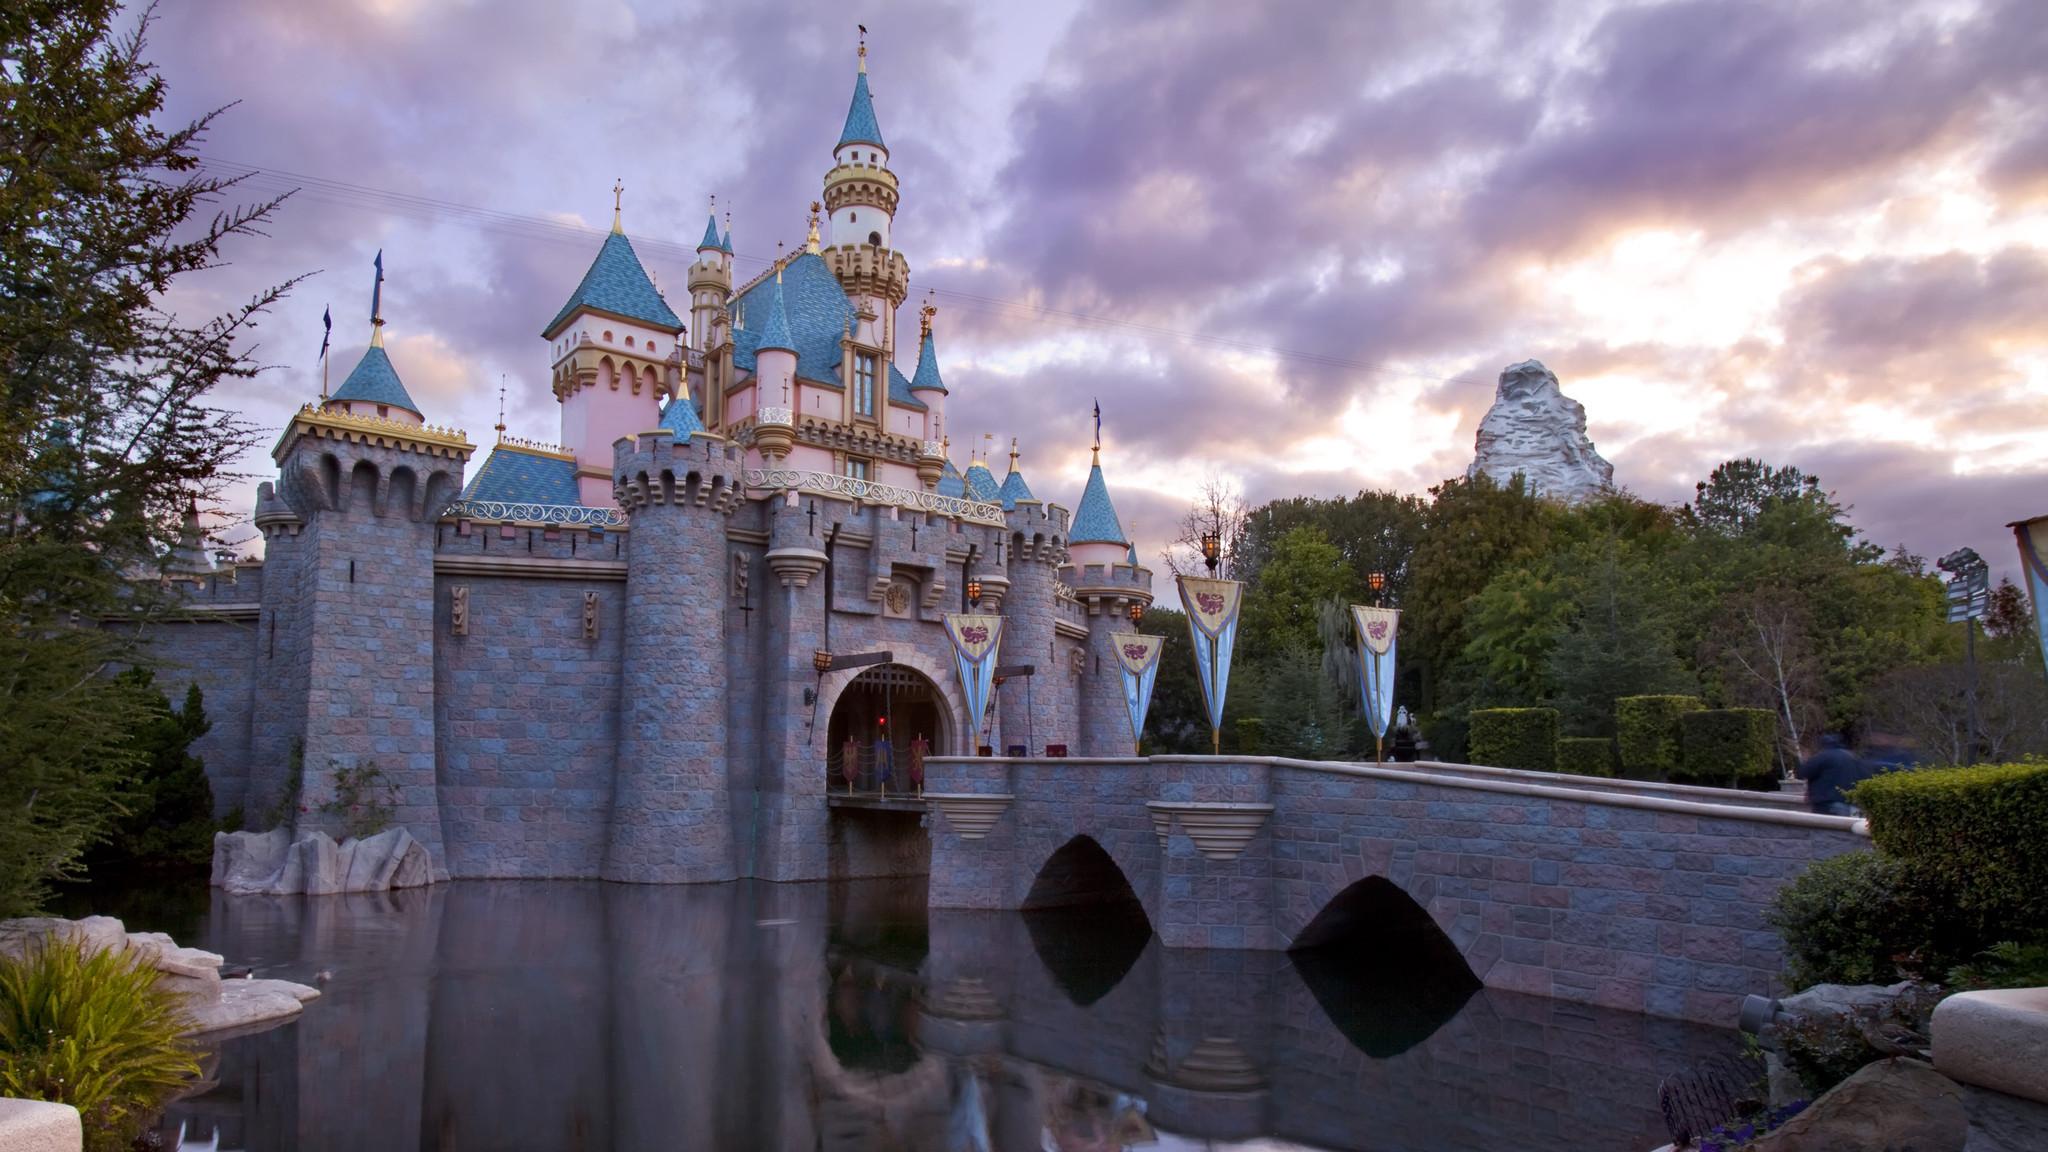 Images Of Disneyland